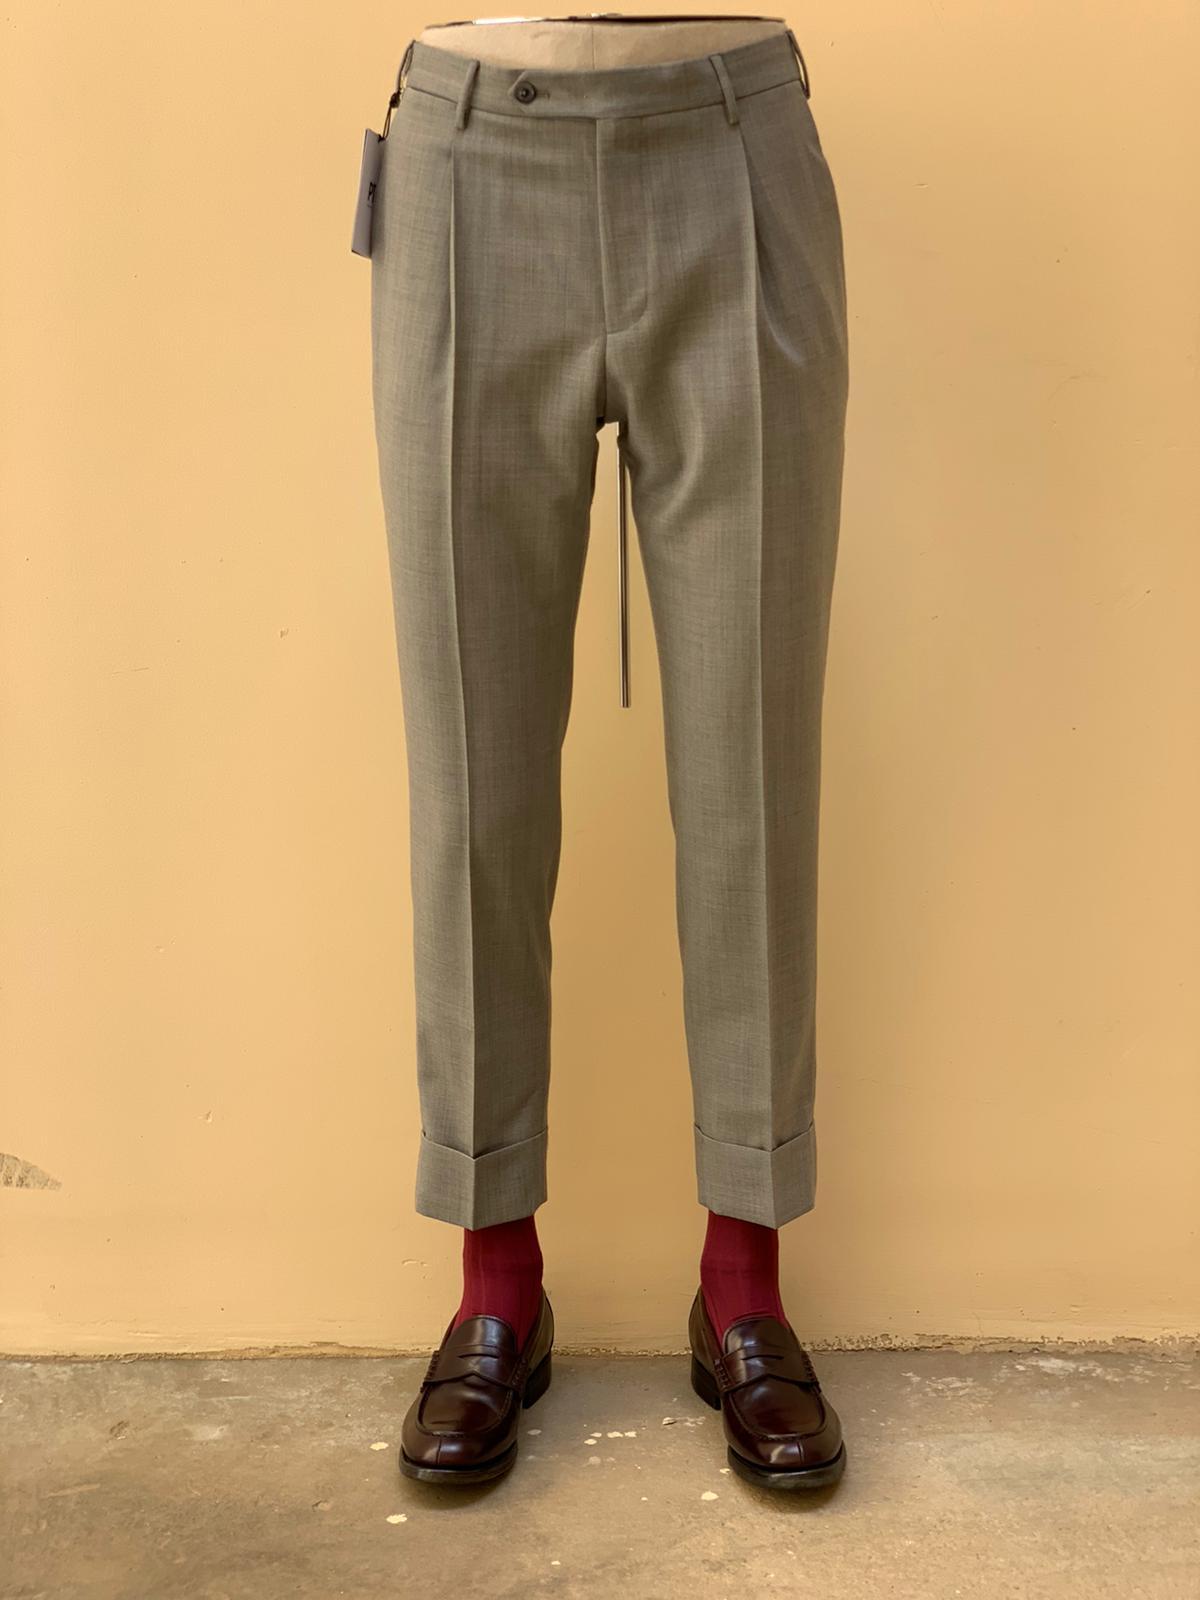 Pantalone Flicker PT01 | 9 | AFFKZ10 MR25230